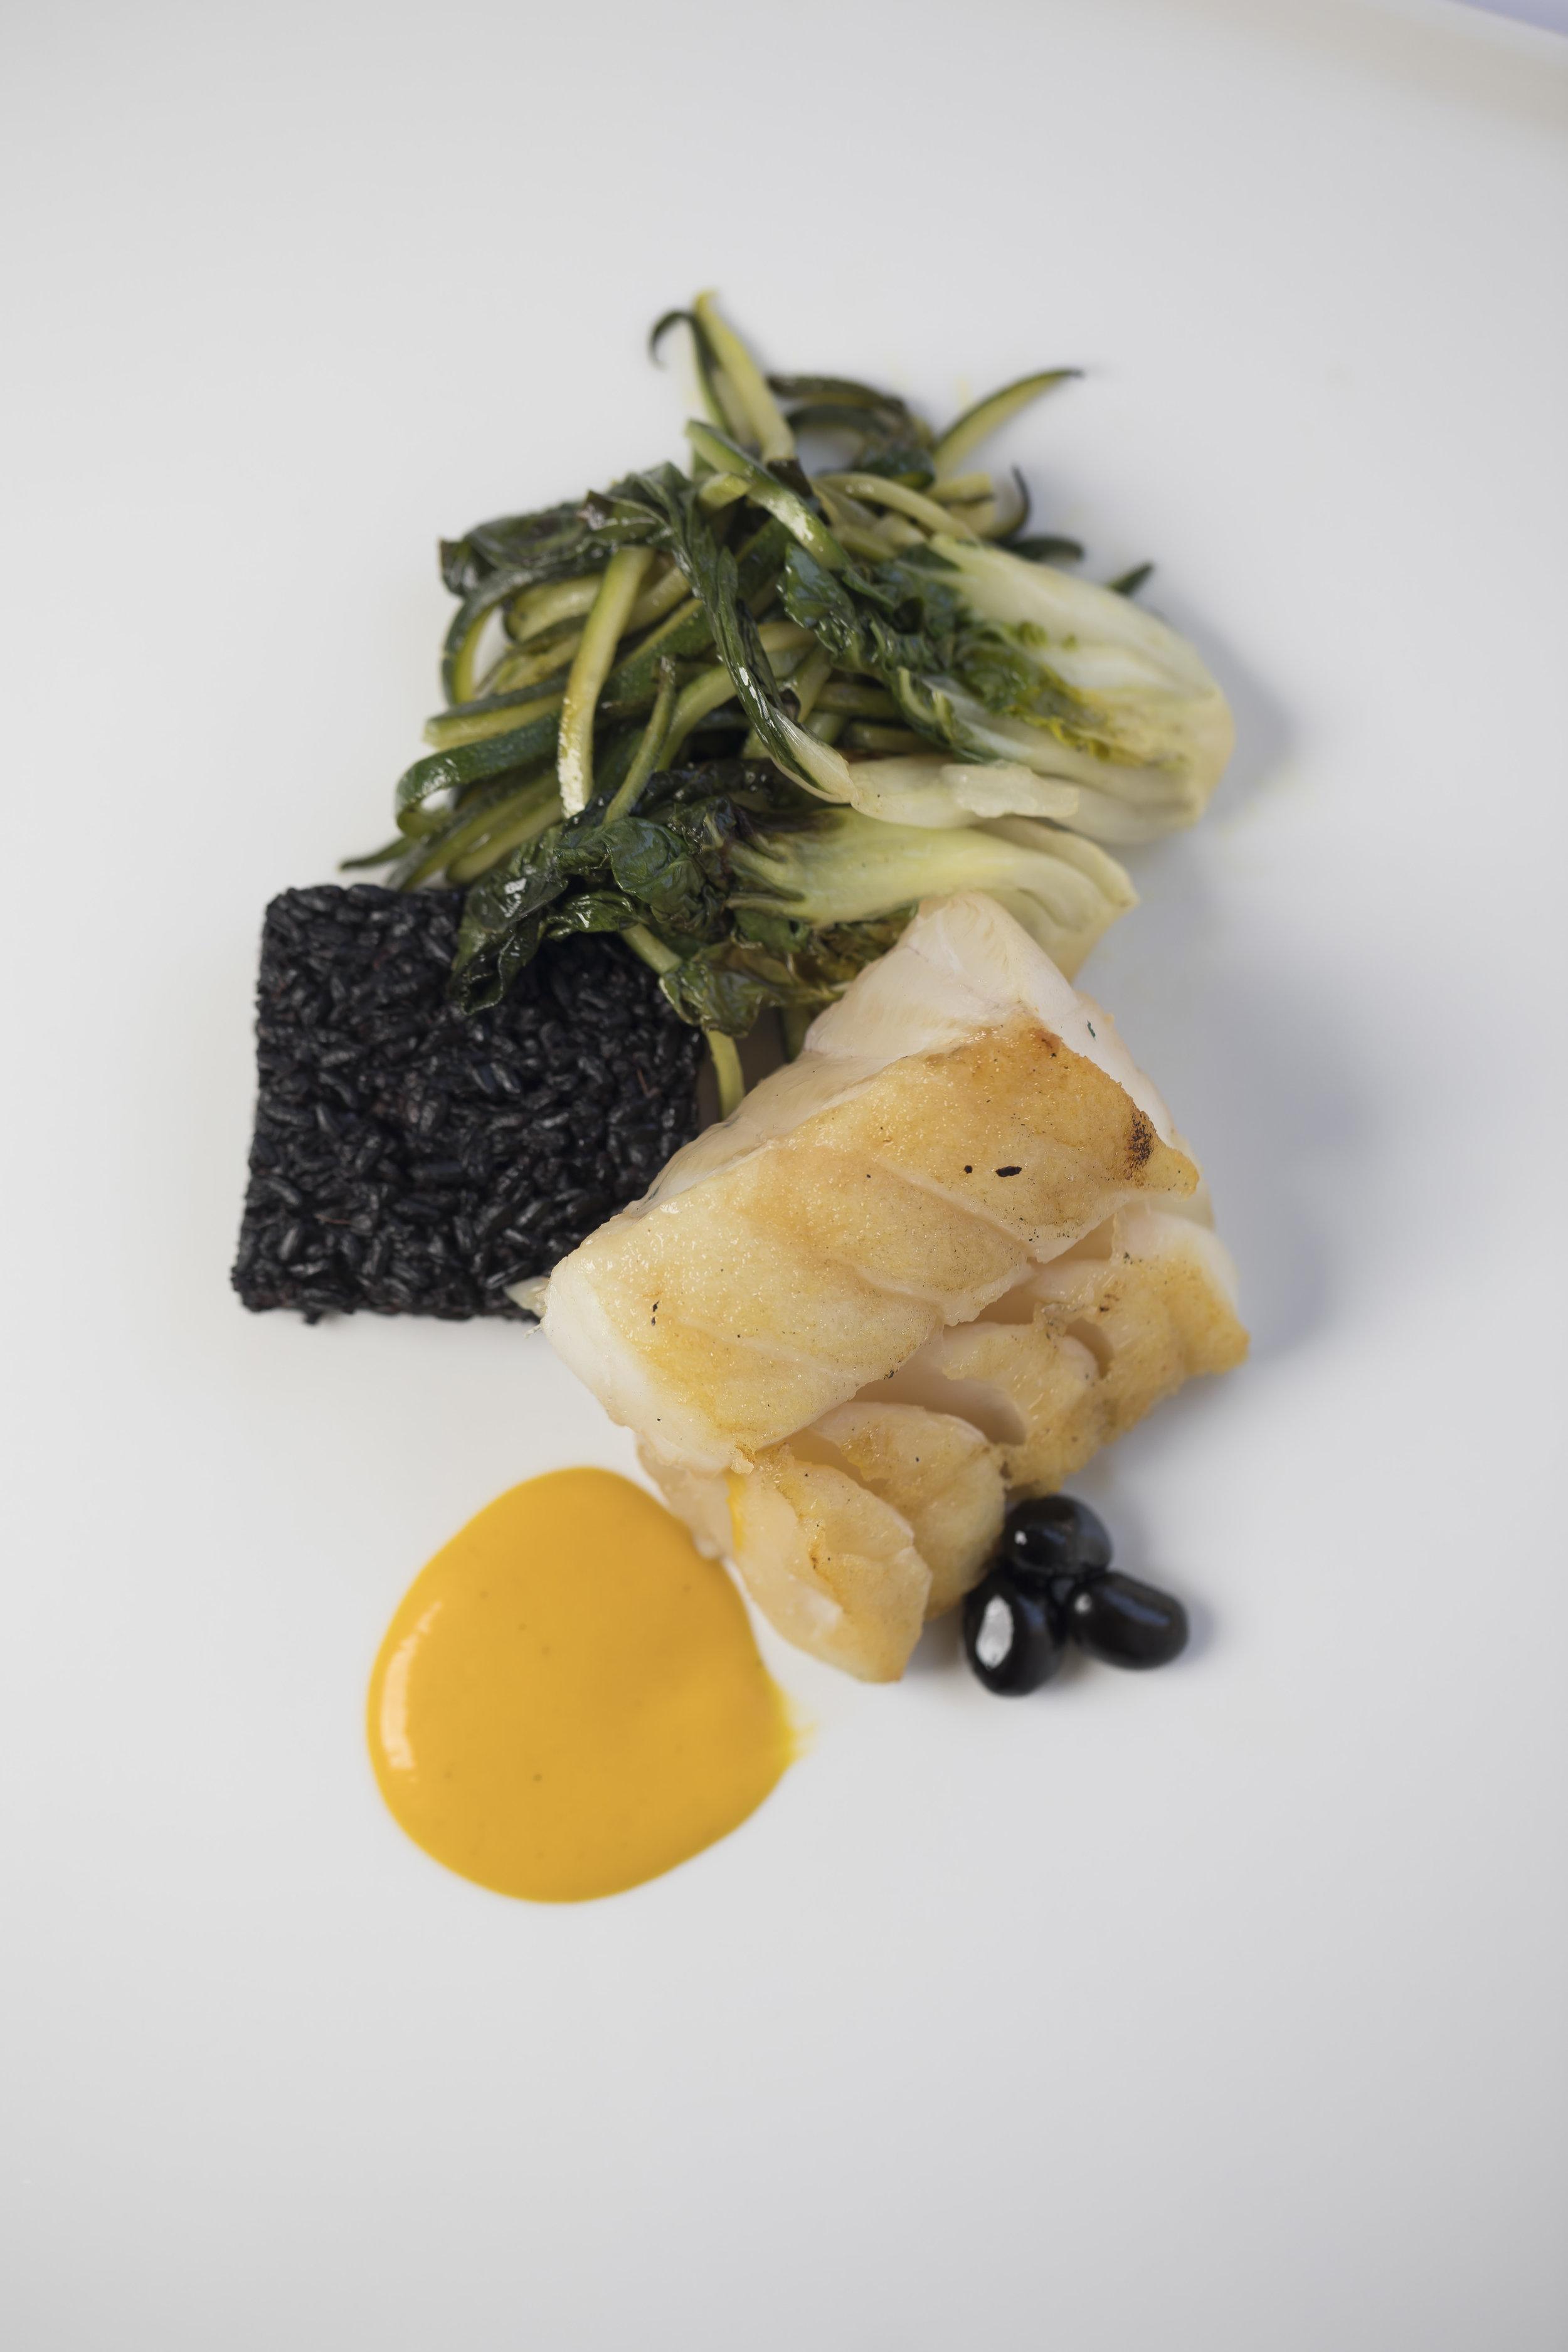 White Soy Glazed Icelandic Cod with Bok Choy and Black Rice Cake_Main_Fall 18 GP Tasting_BH_02 (1).JPG